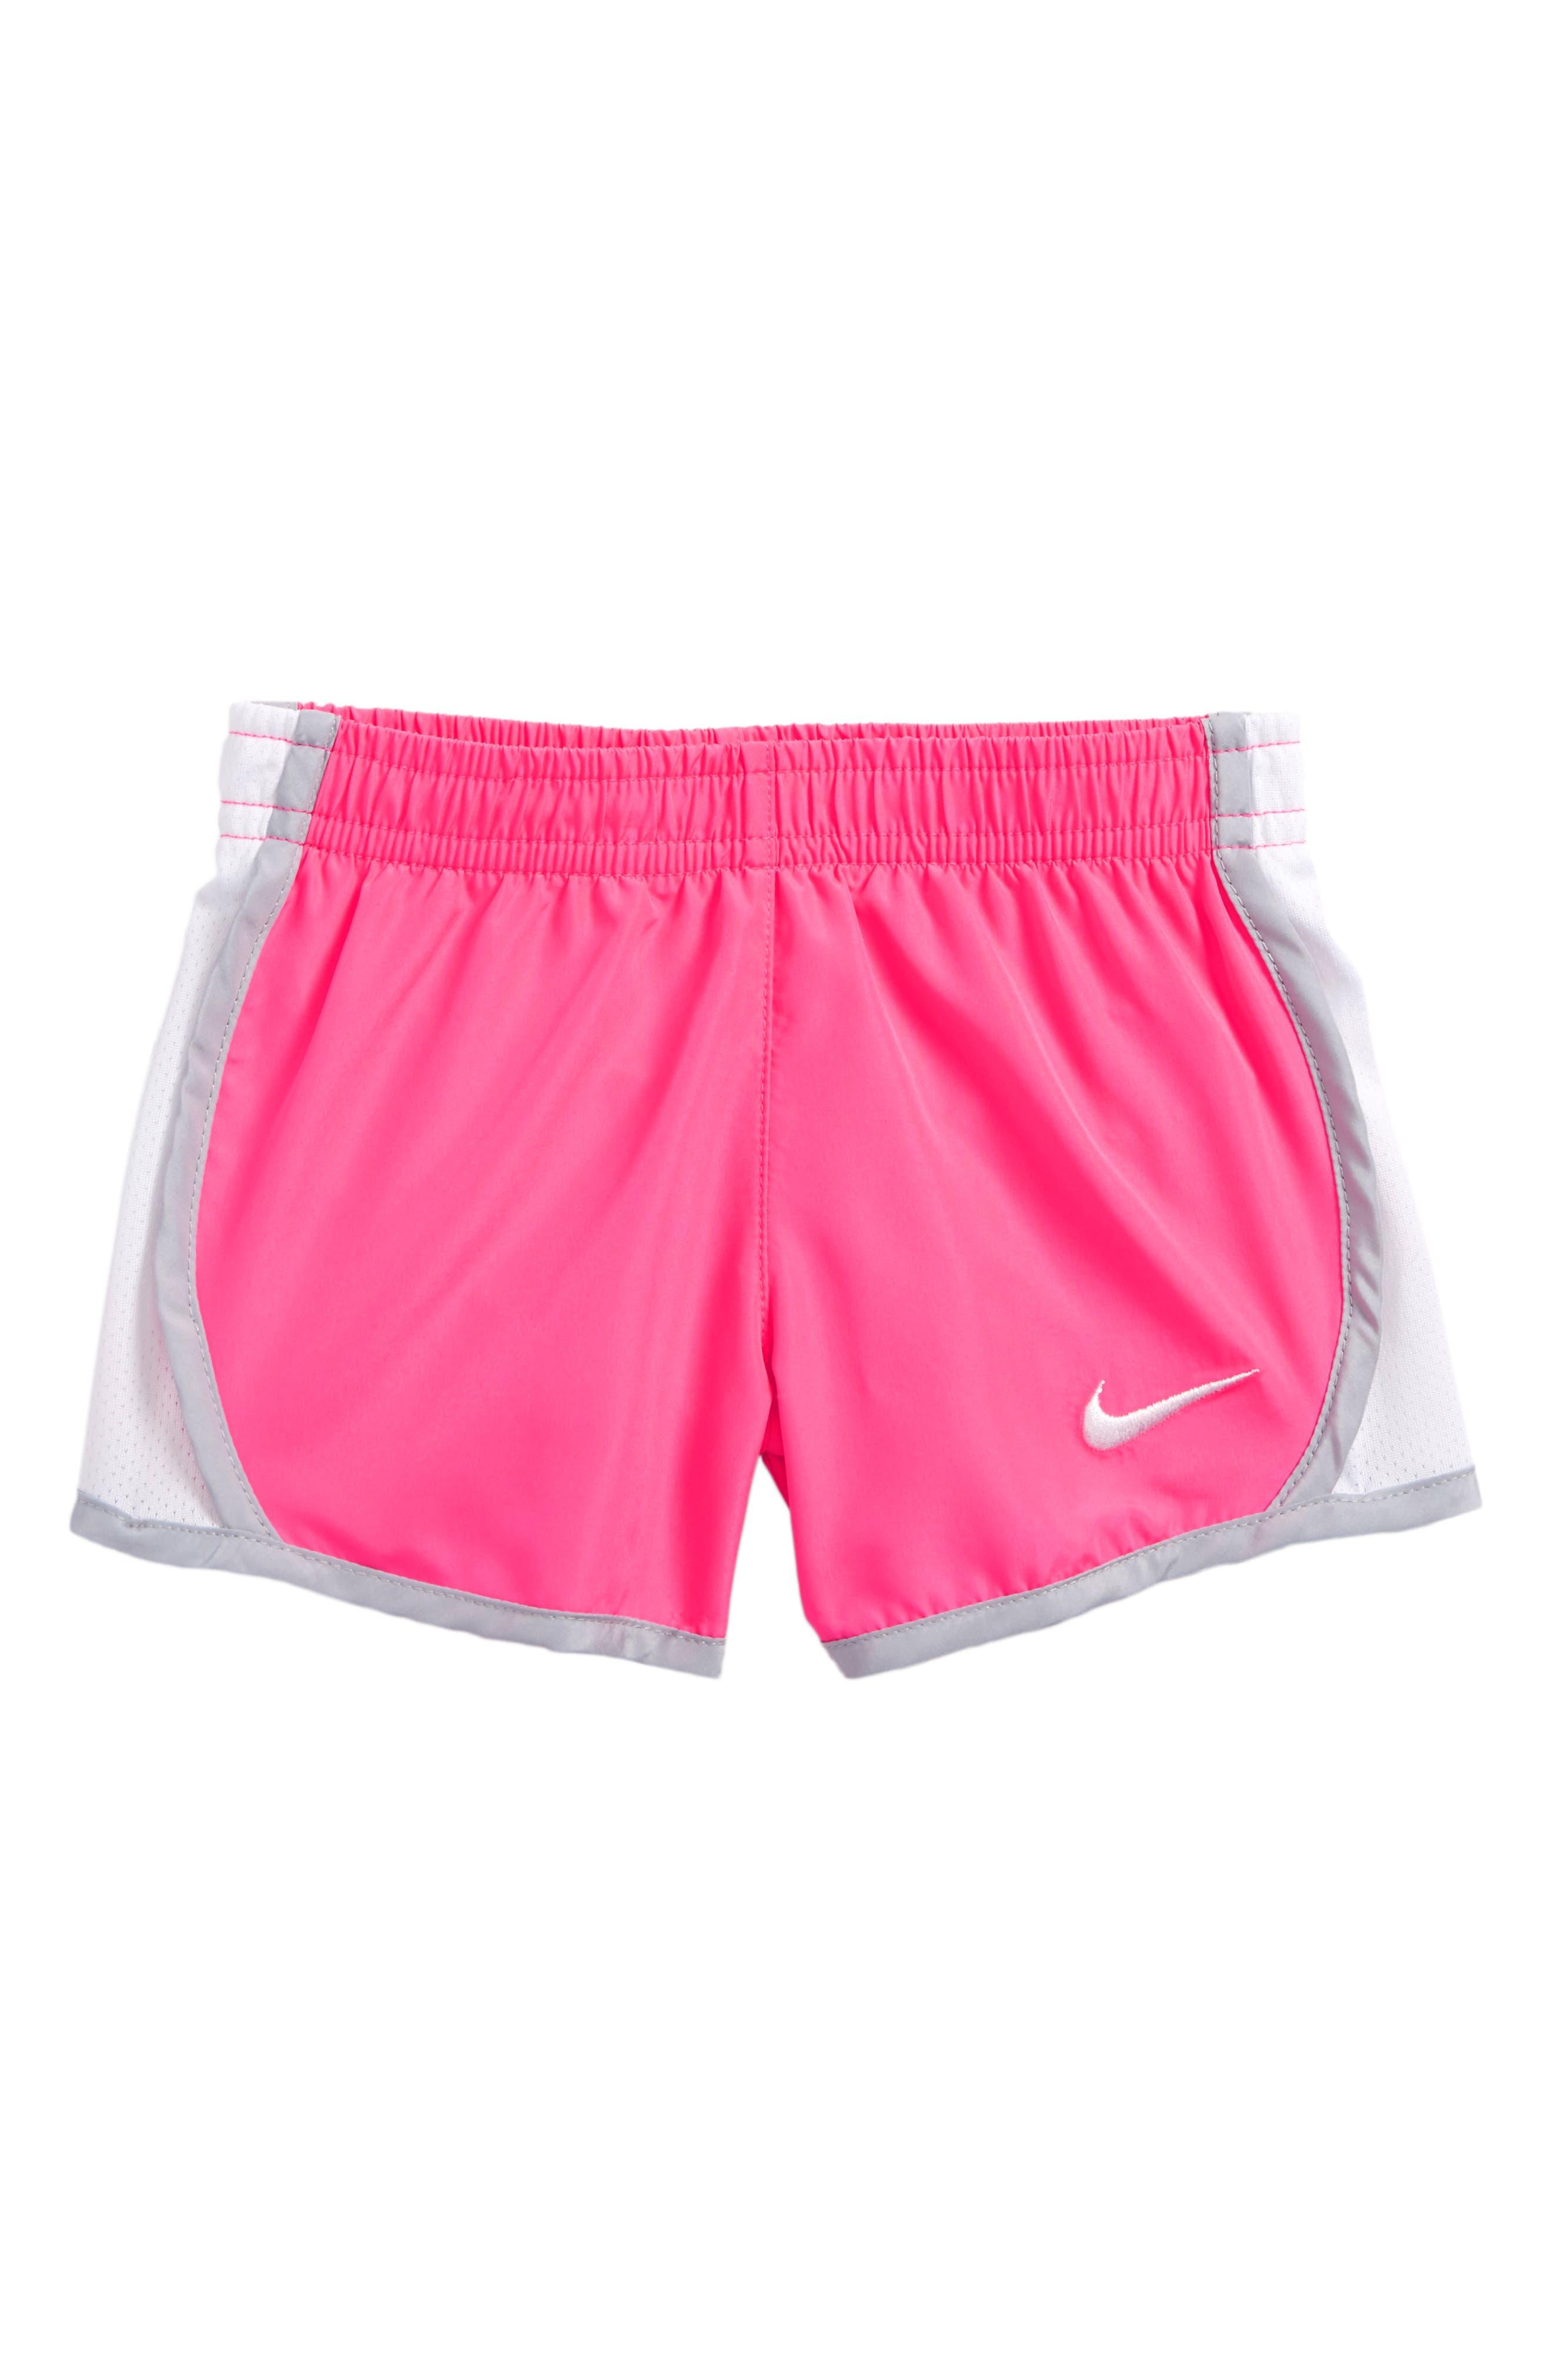 'Tempo' Dri-FIT Shorts,                         Main,                         color, Pink Pow